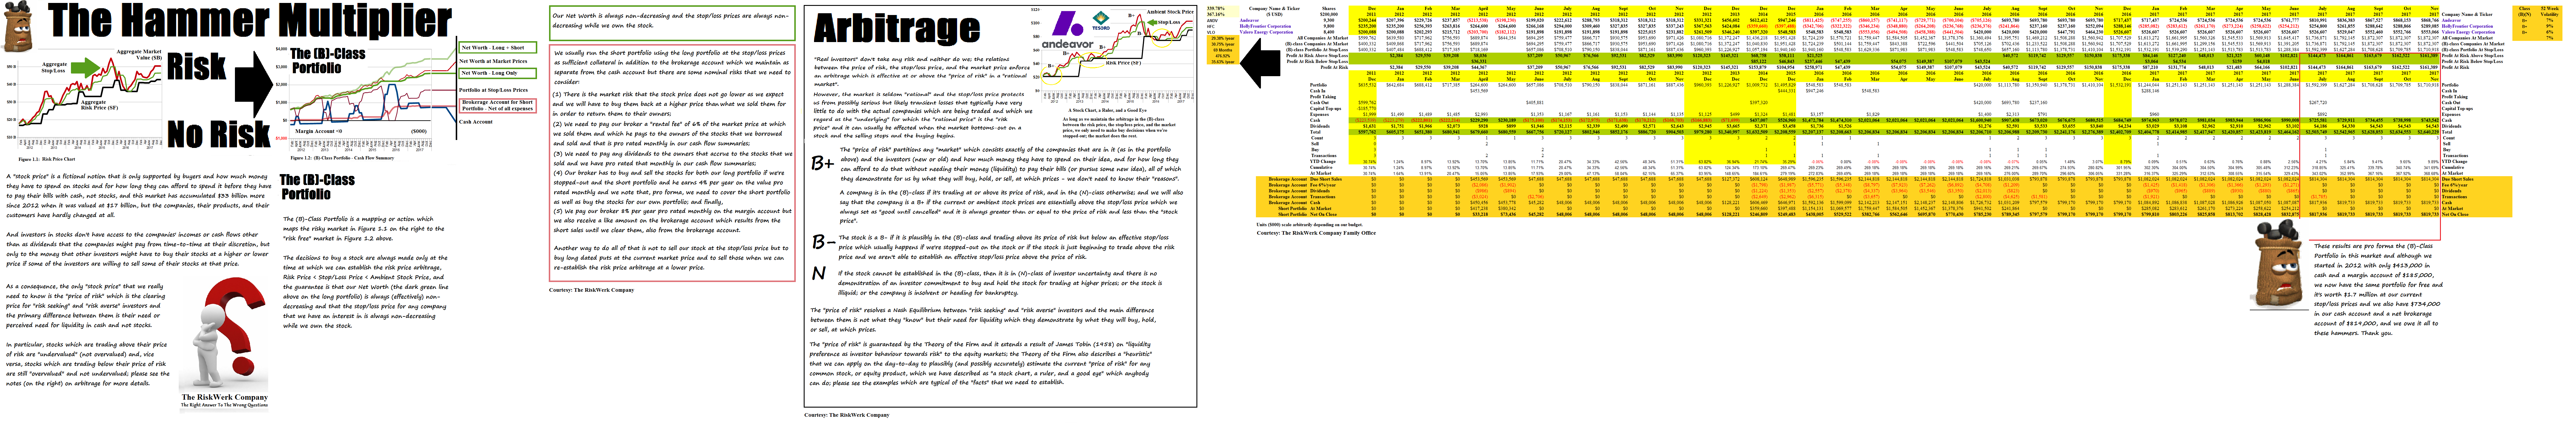 Vlo Stock Quote Bn The Refiners  Andeavor Hollyfrontier And Valero  Riskwerk